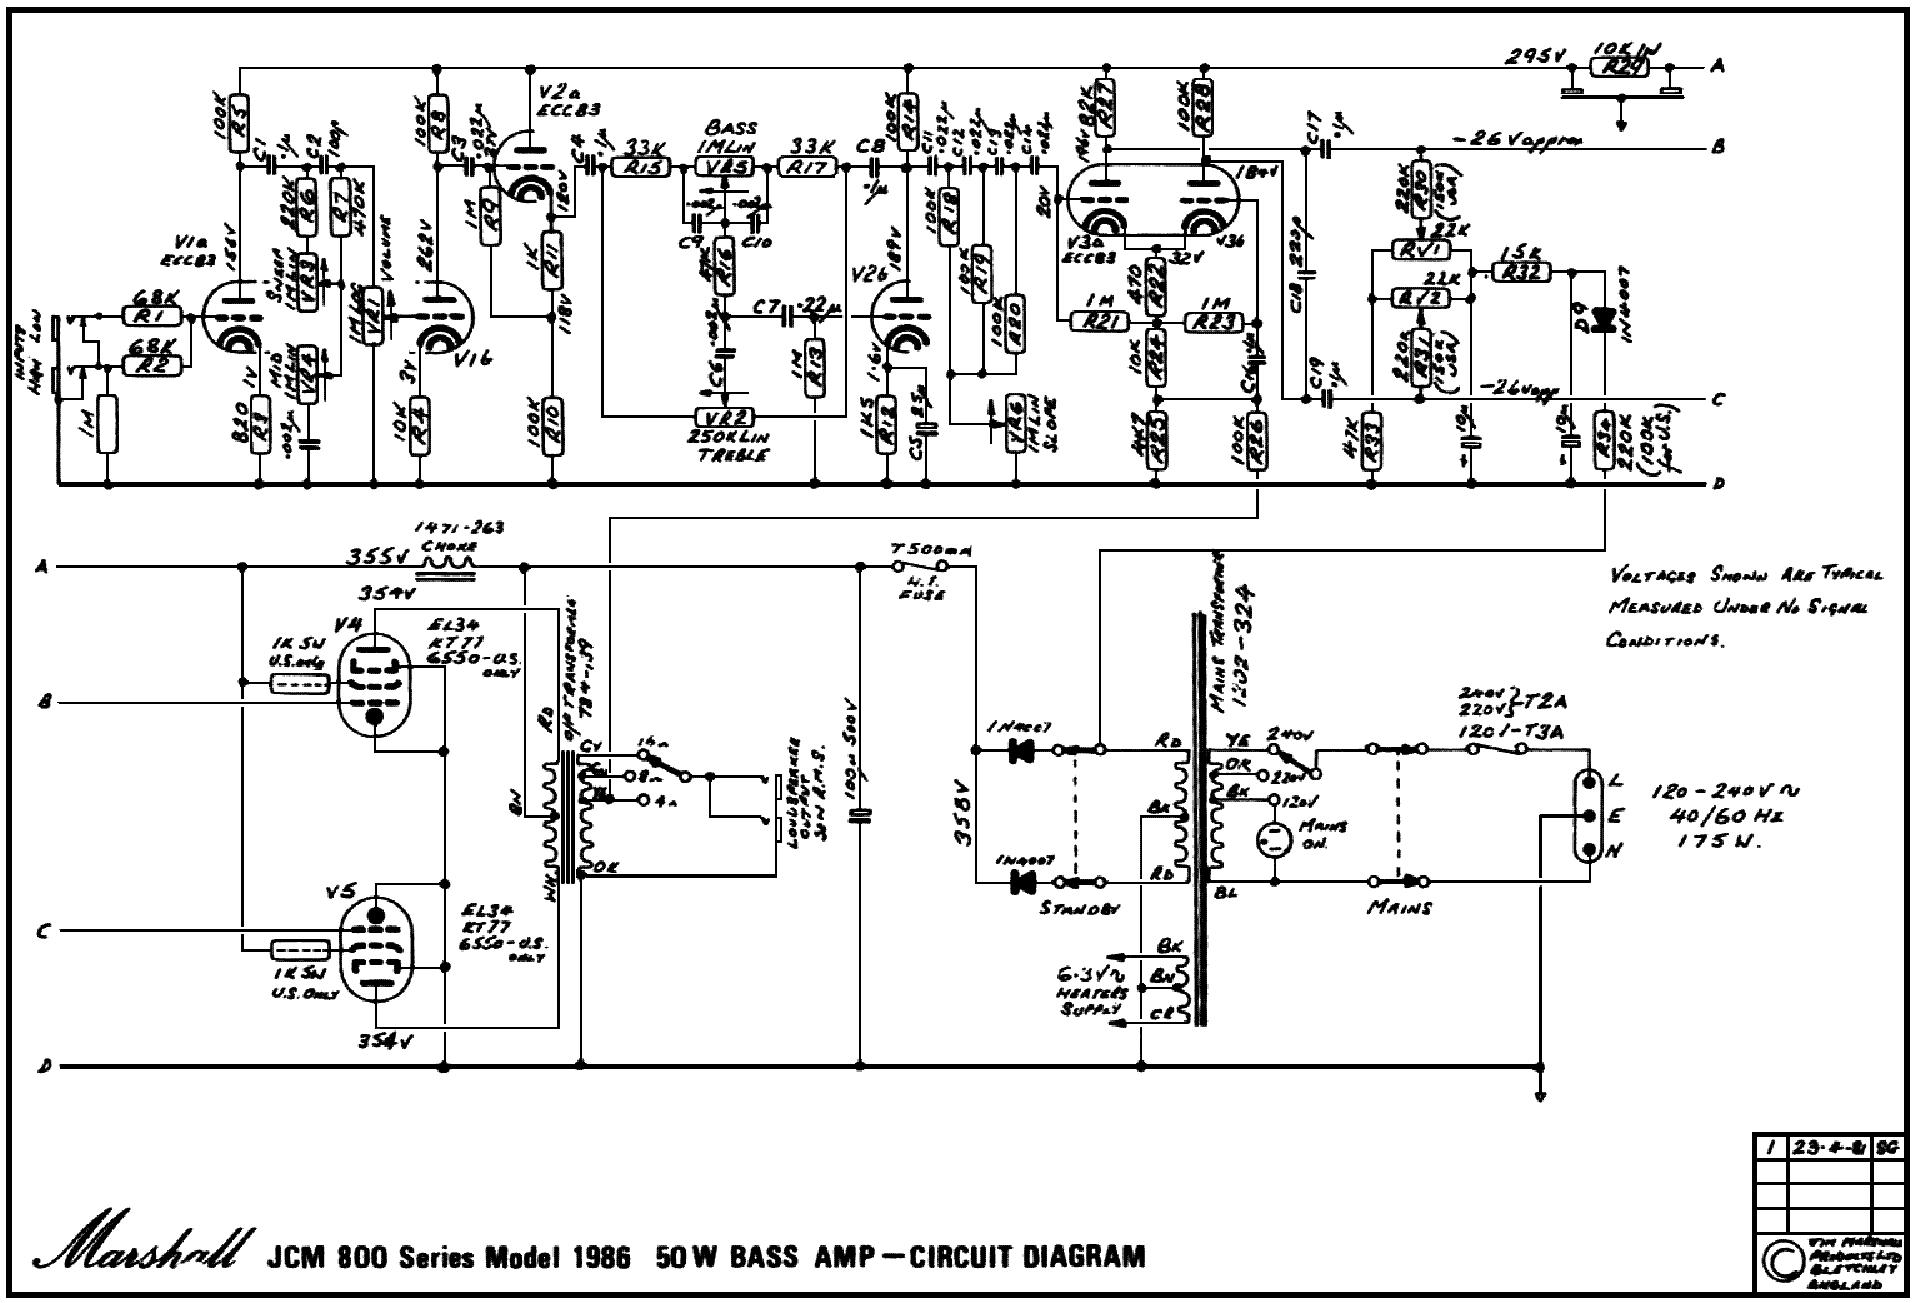 Marshall Jcm 800 Wiring Diagram Schematic